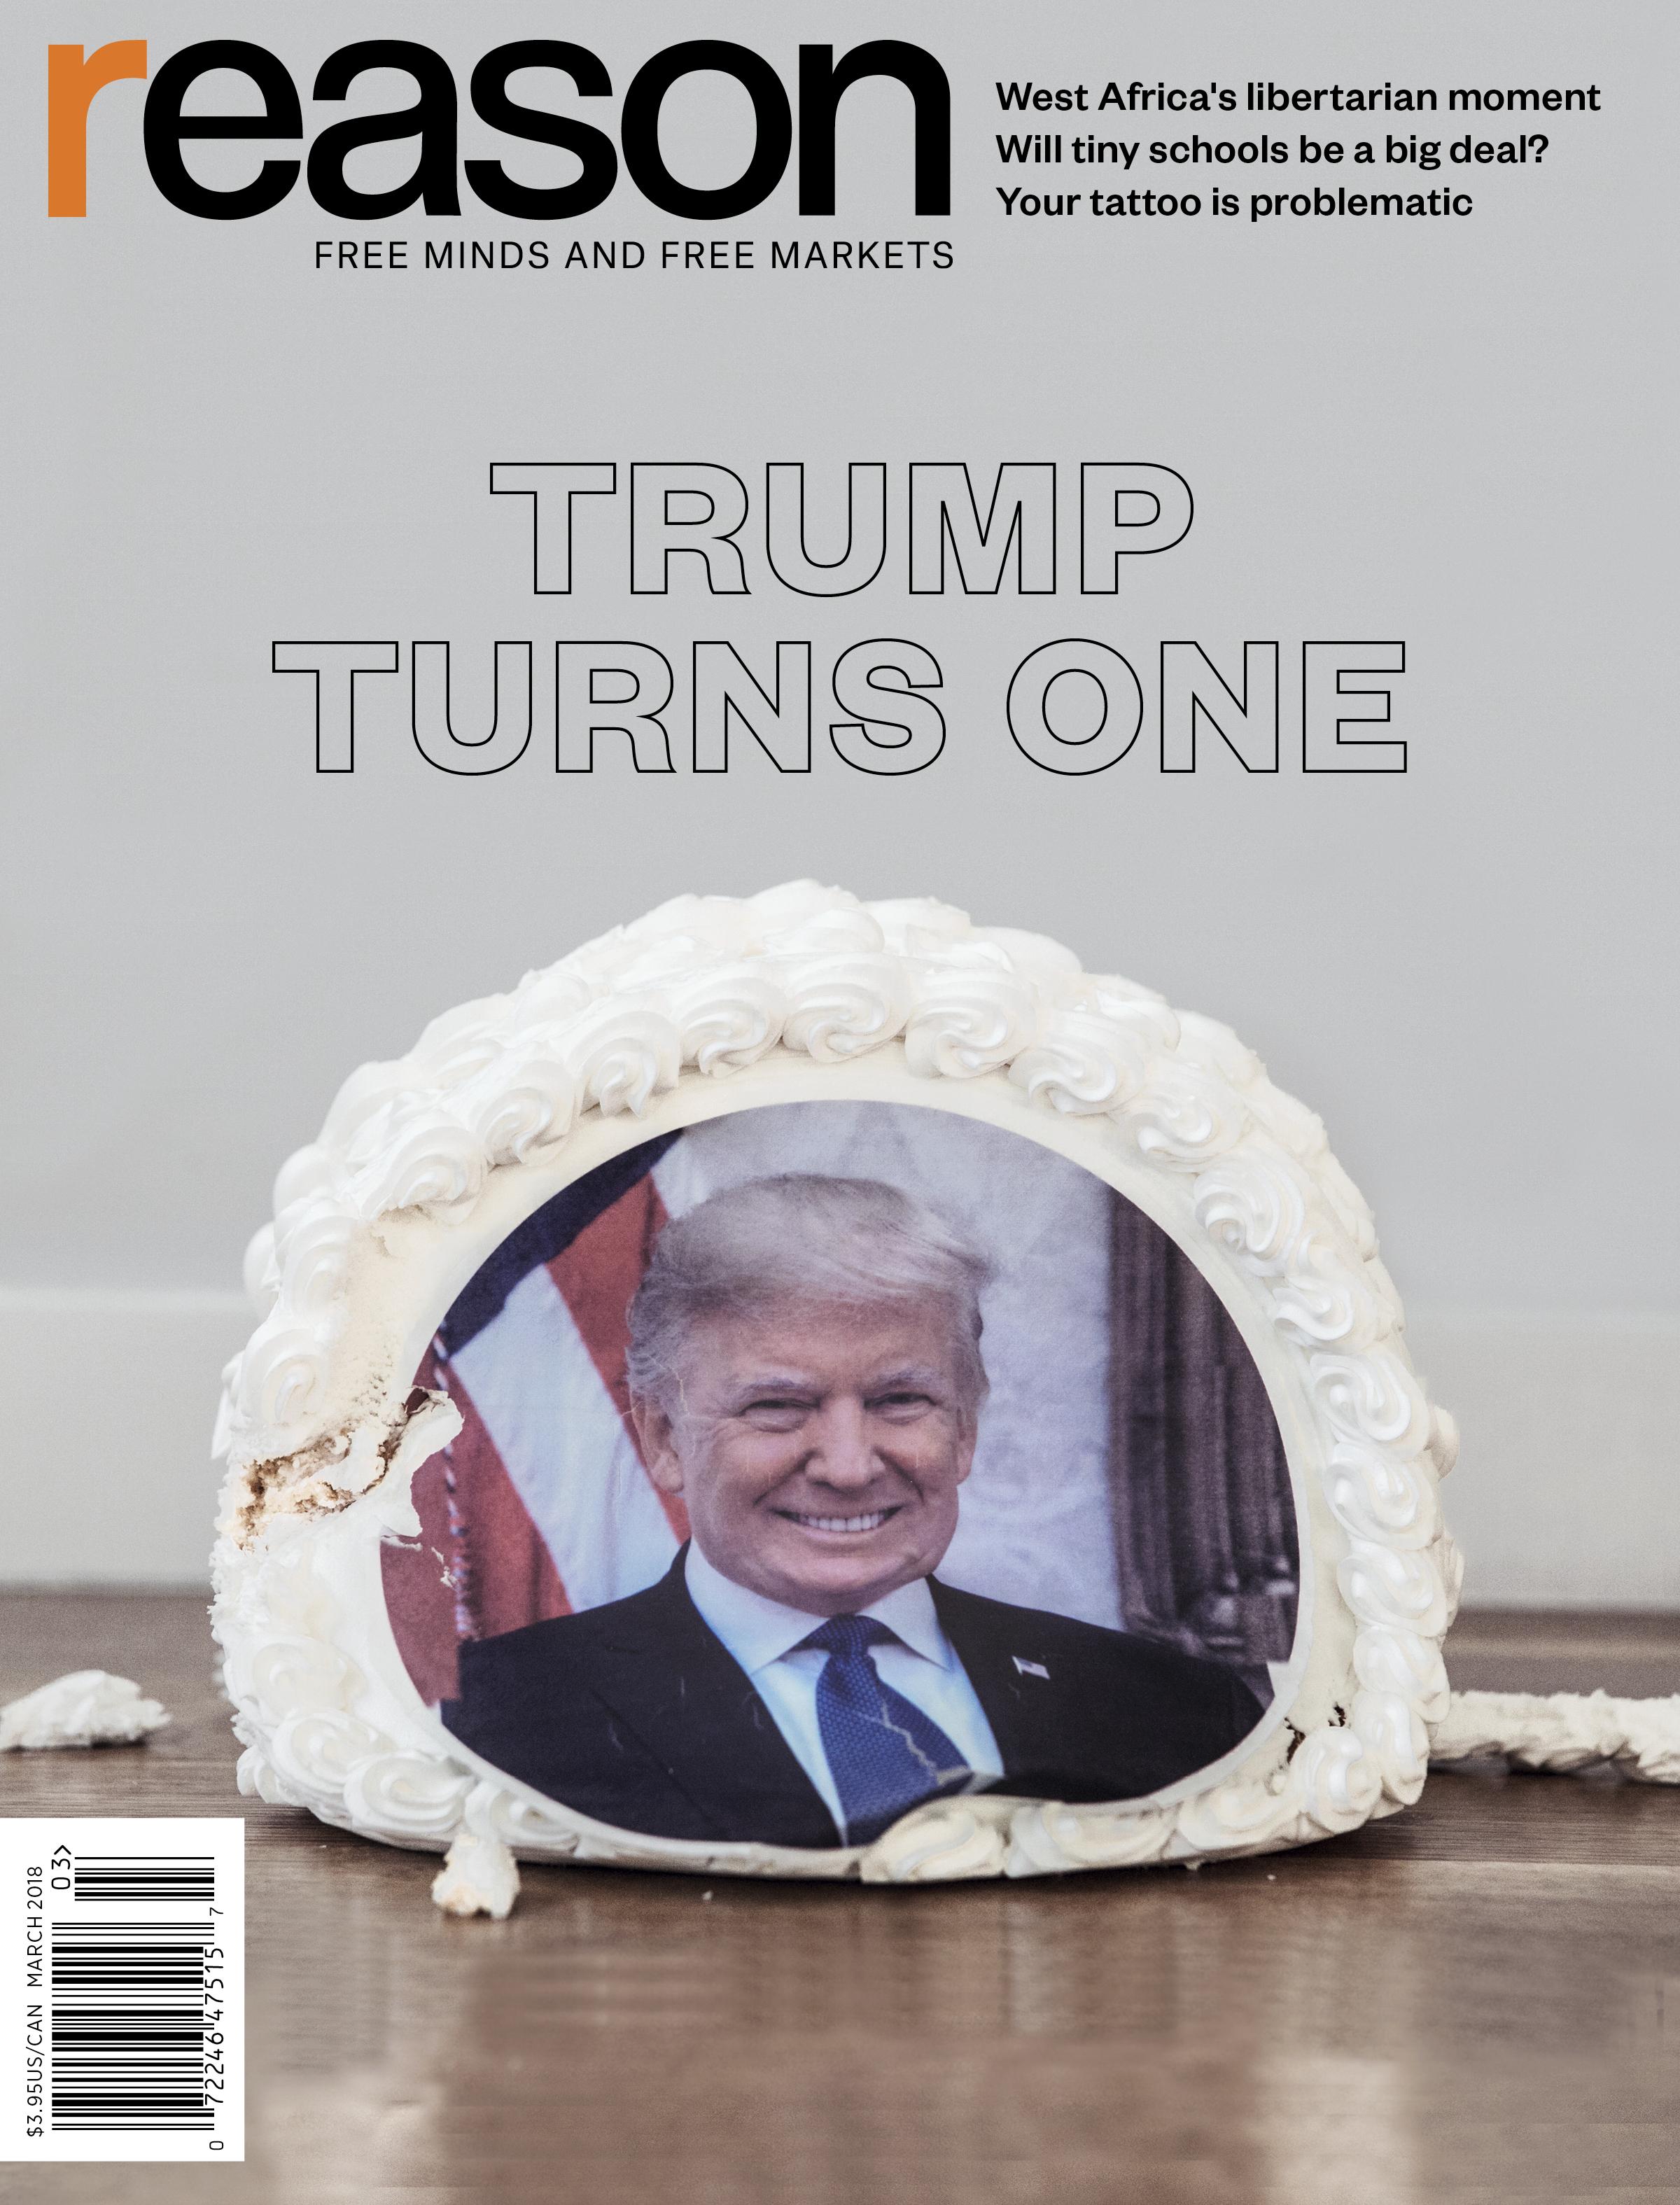 Reason Magazine, March 2018 cover image